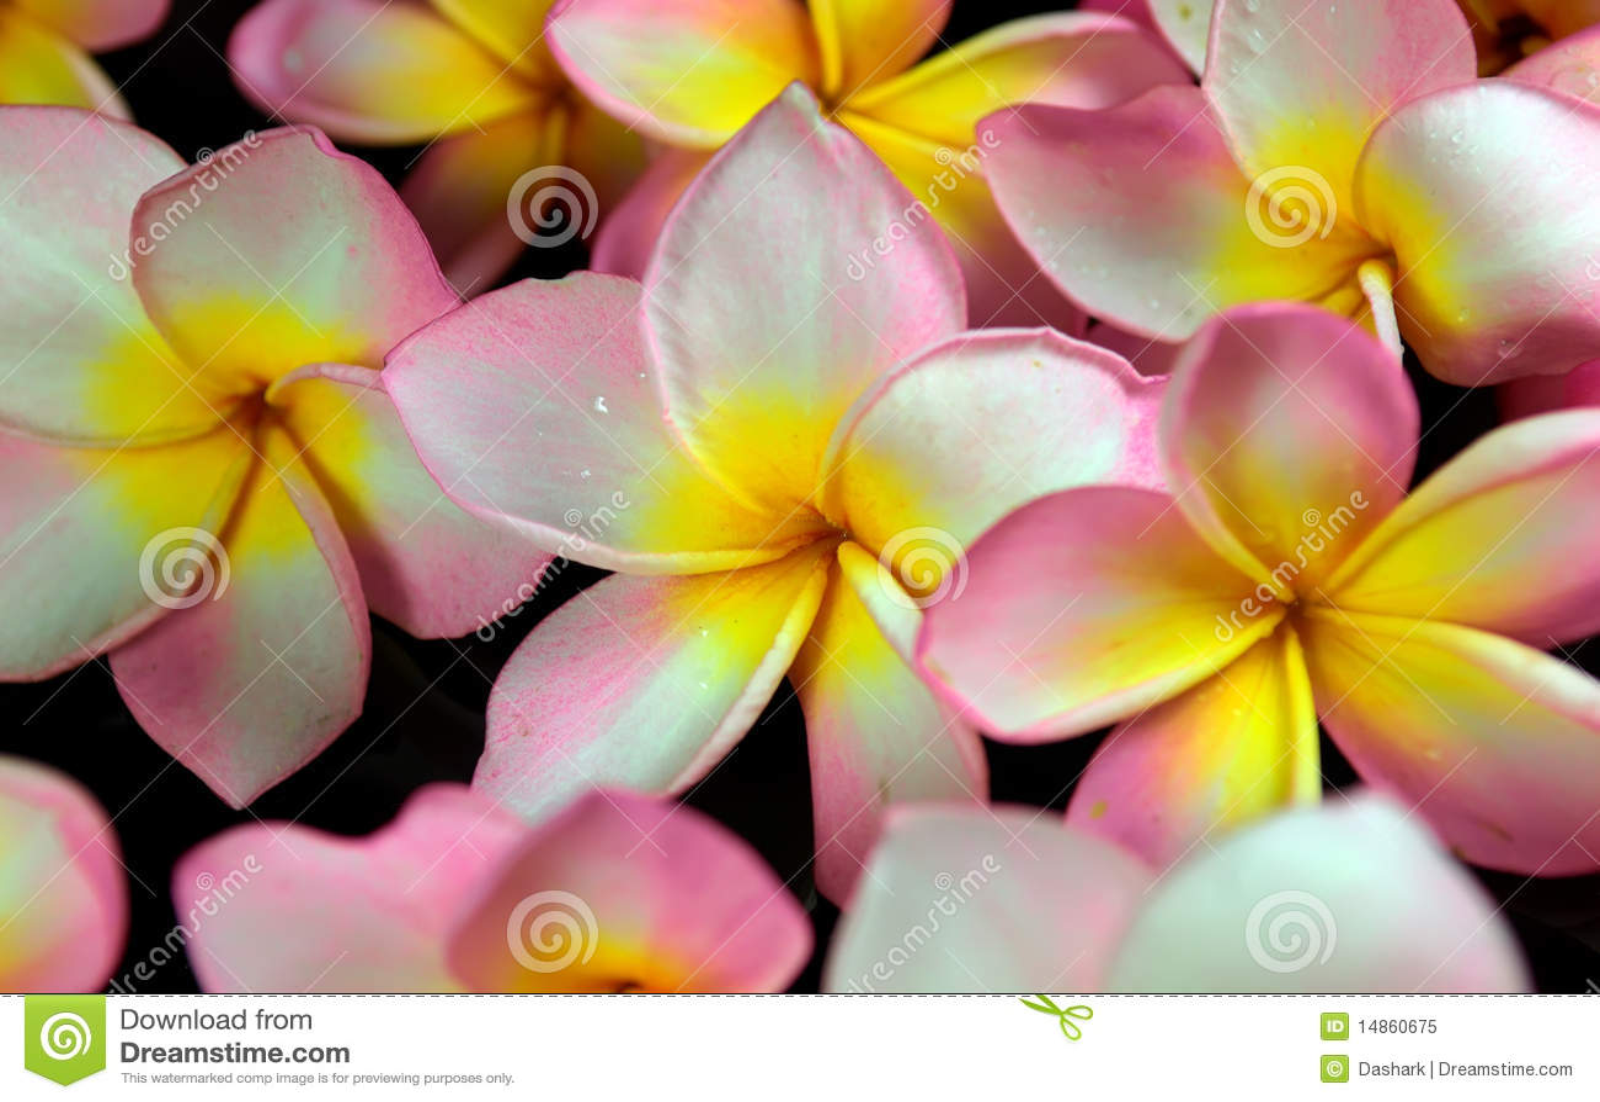 Plumeria tropical flower